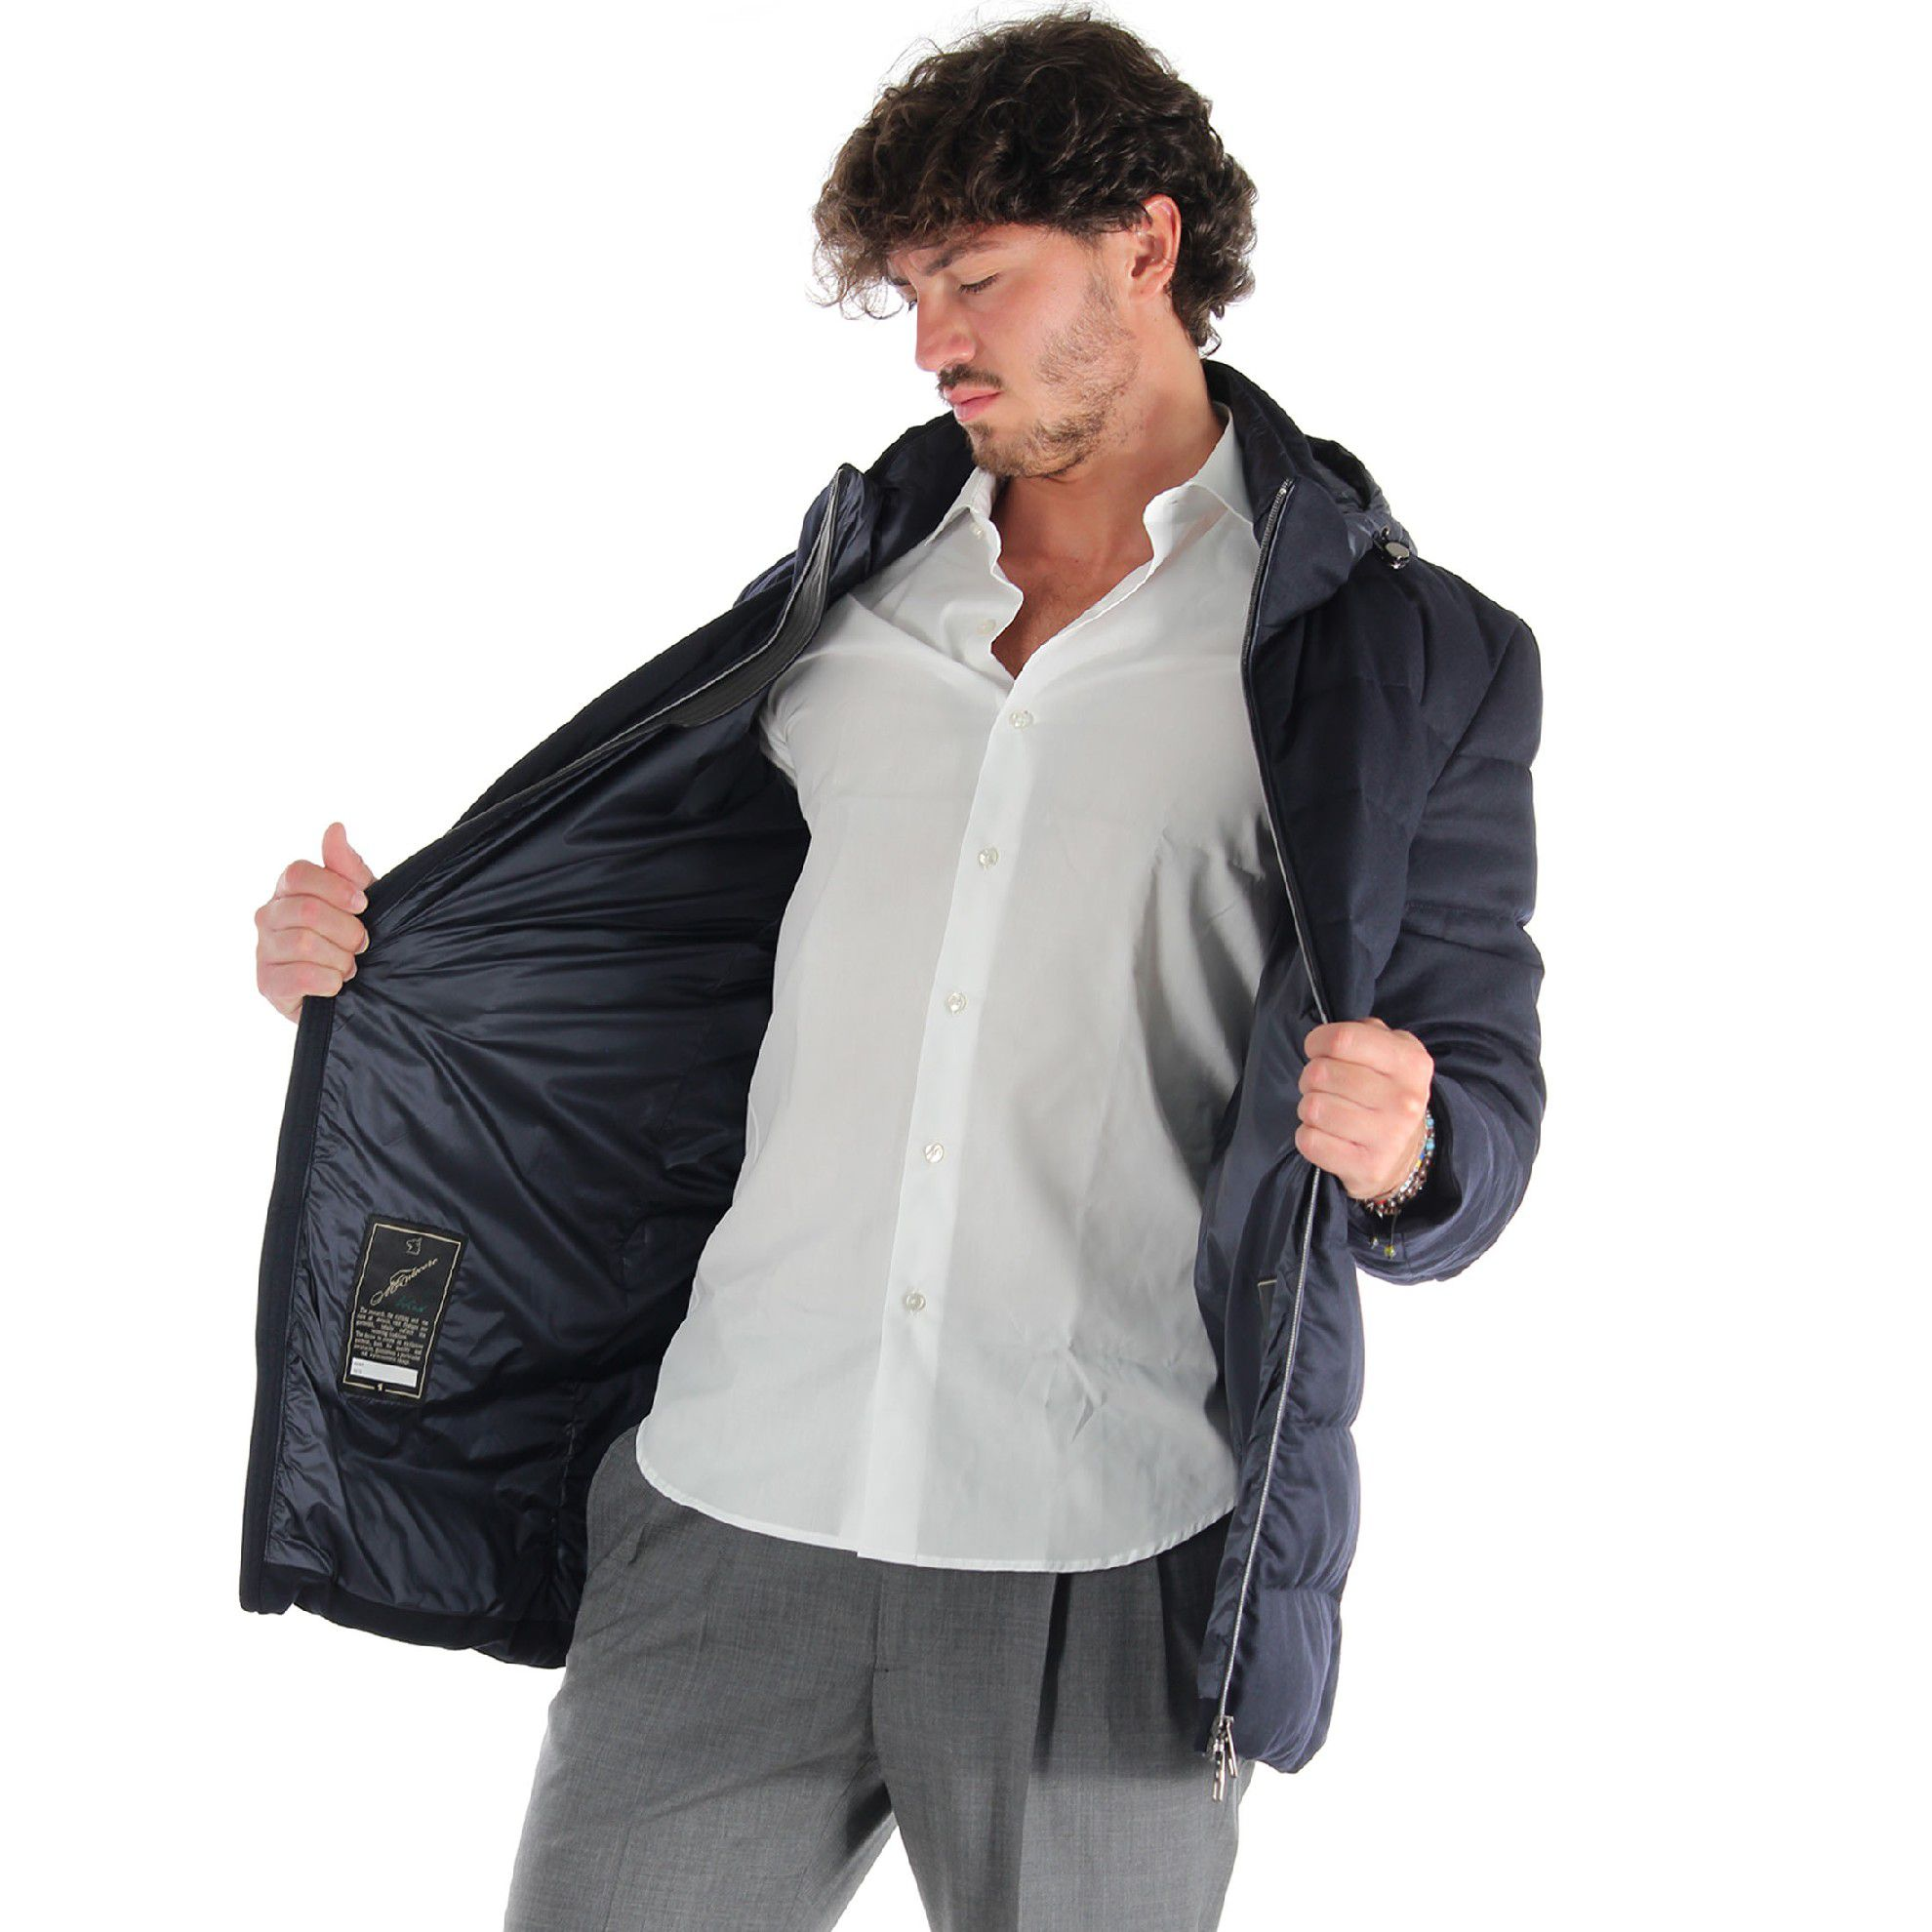 Montecore piumino lungo 100% lana vergine da uomo